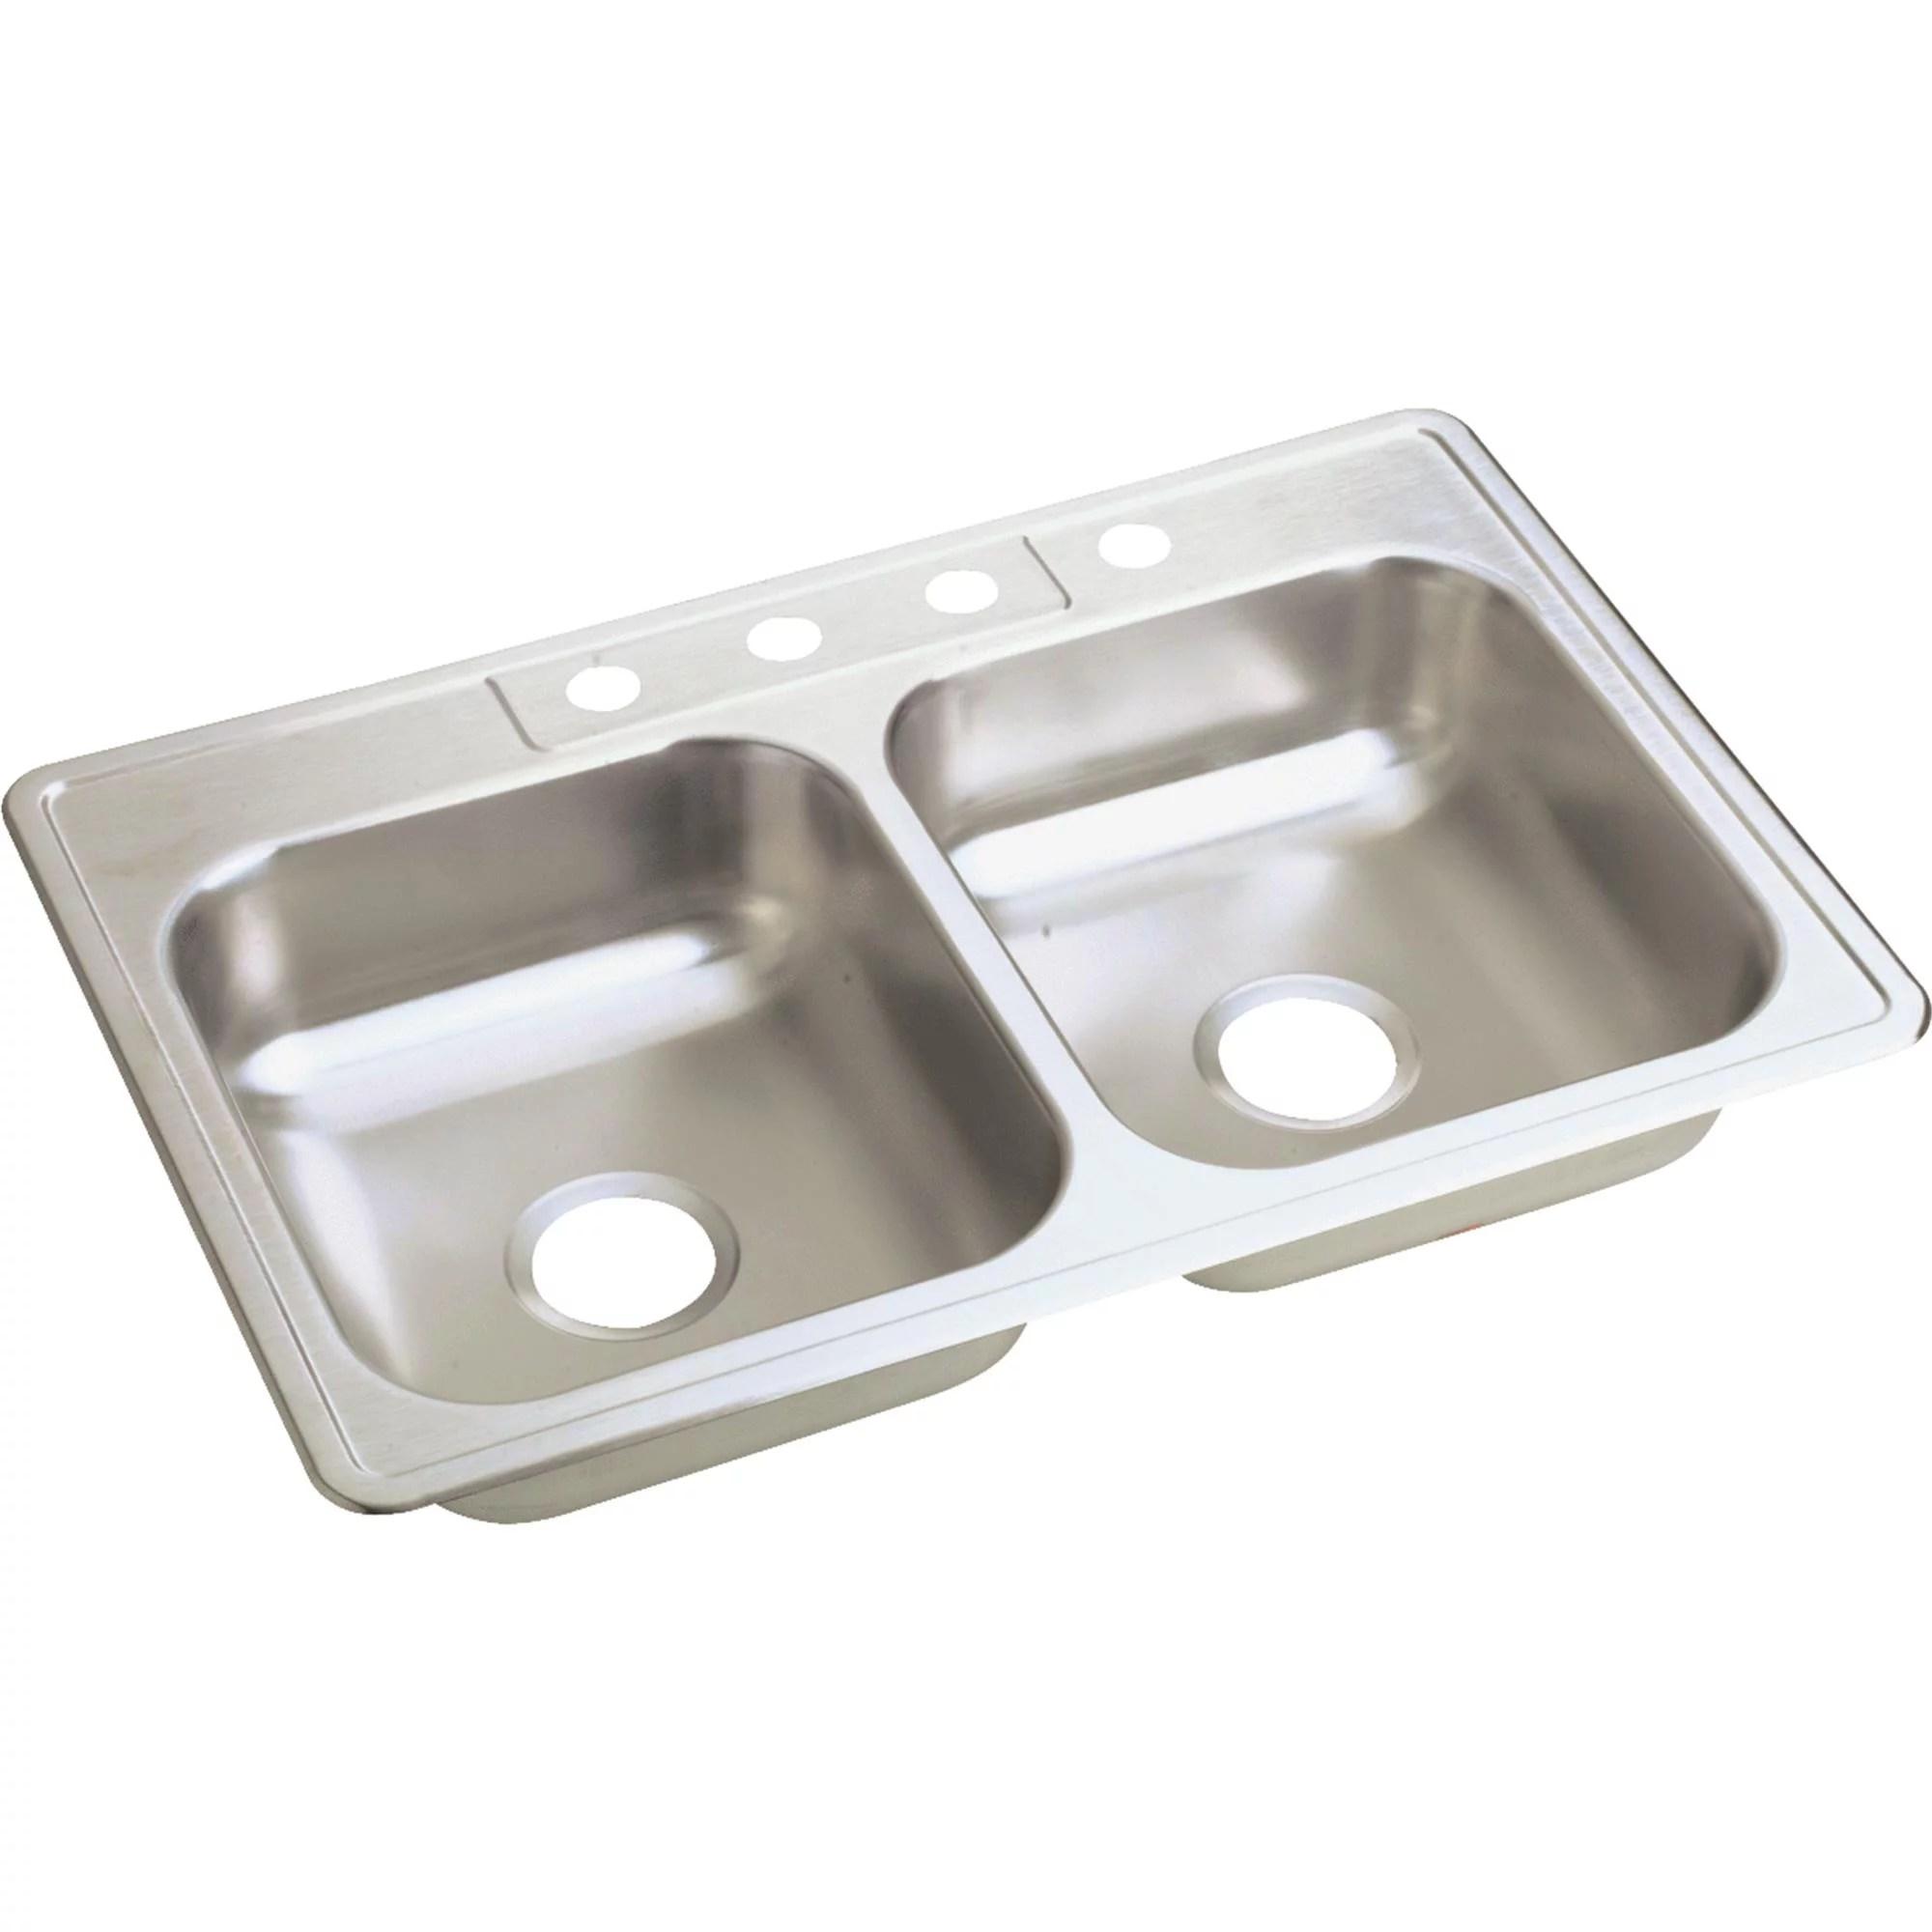 double bowl sink 6 deep stainless steel walmart com